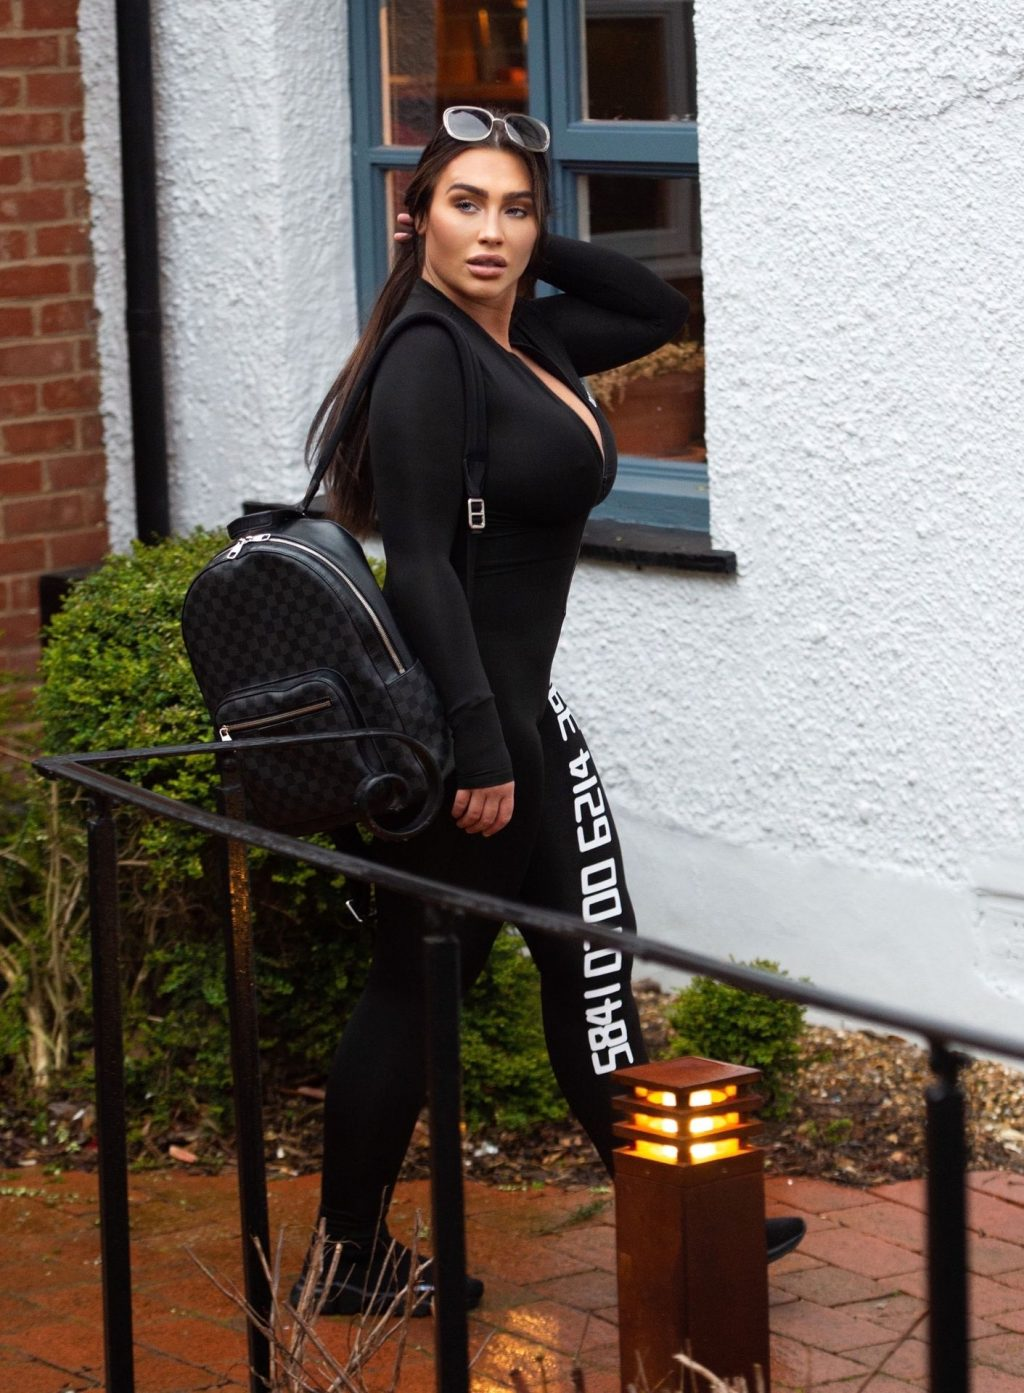 Lauren Goodger is Seen Leaving Her Home in a Black Jumpsuit (20 Photos)